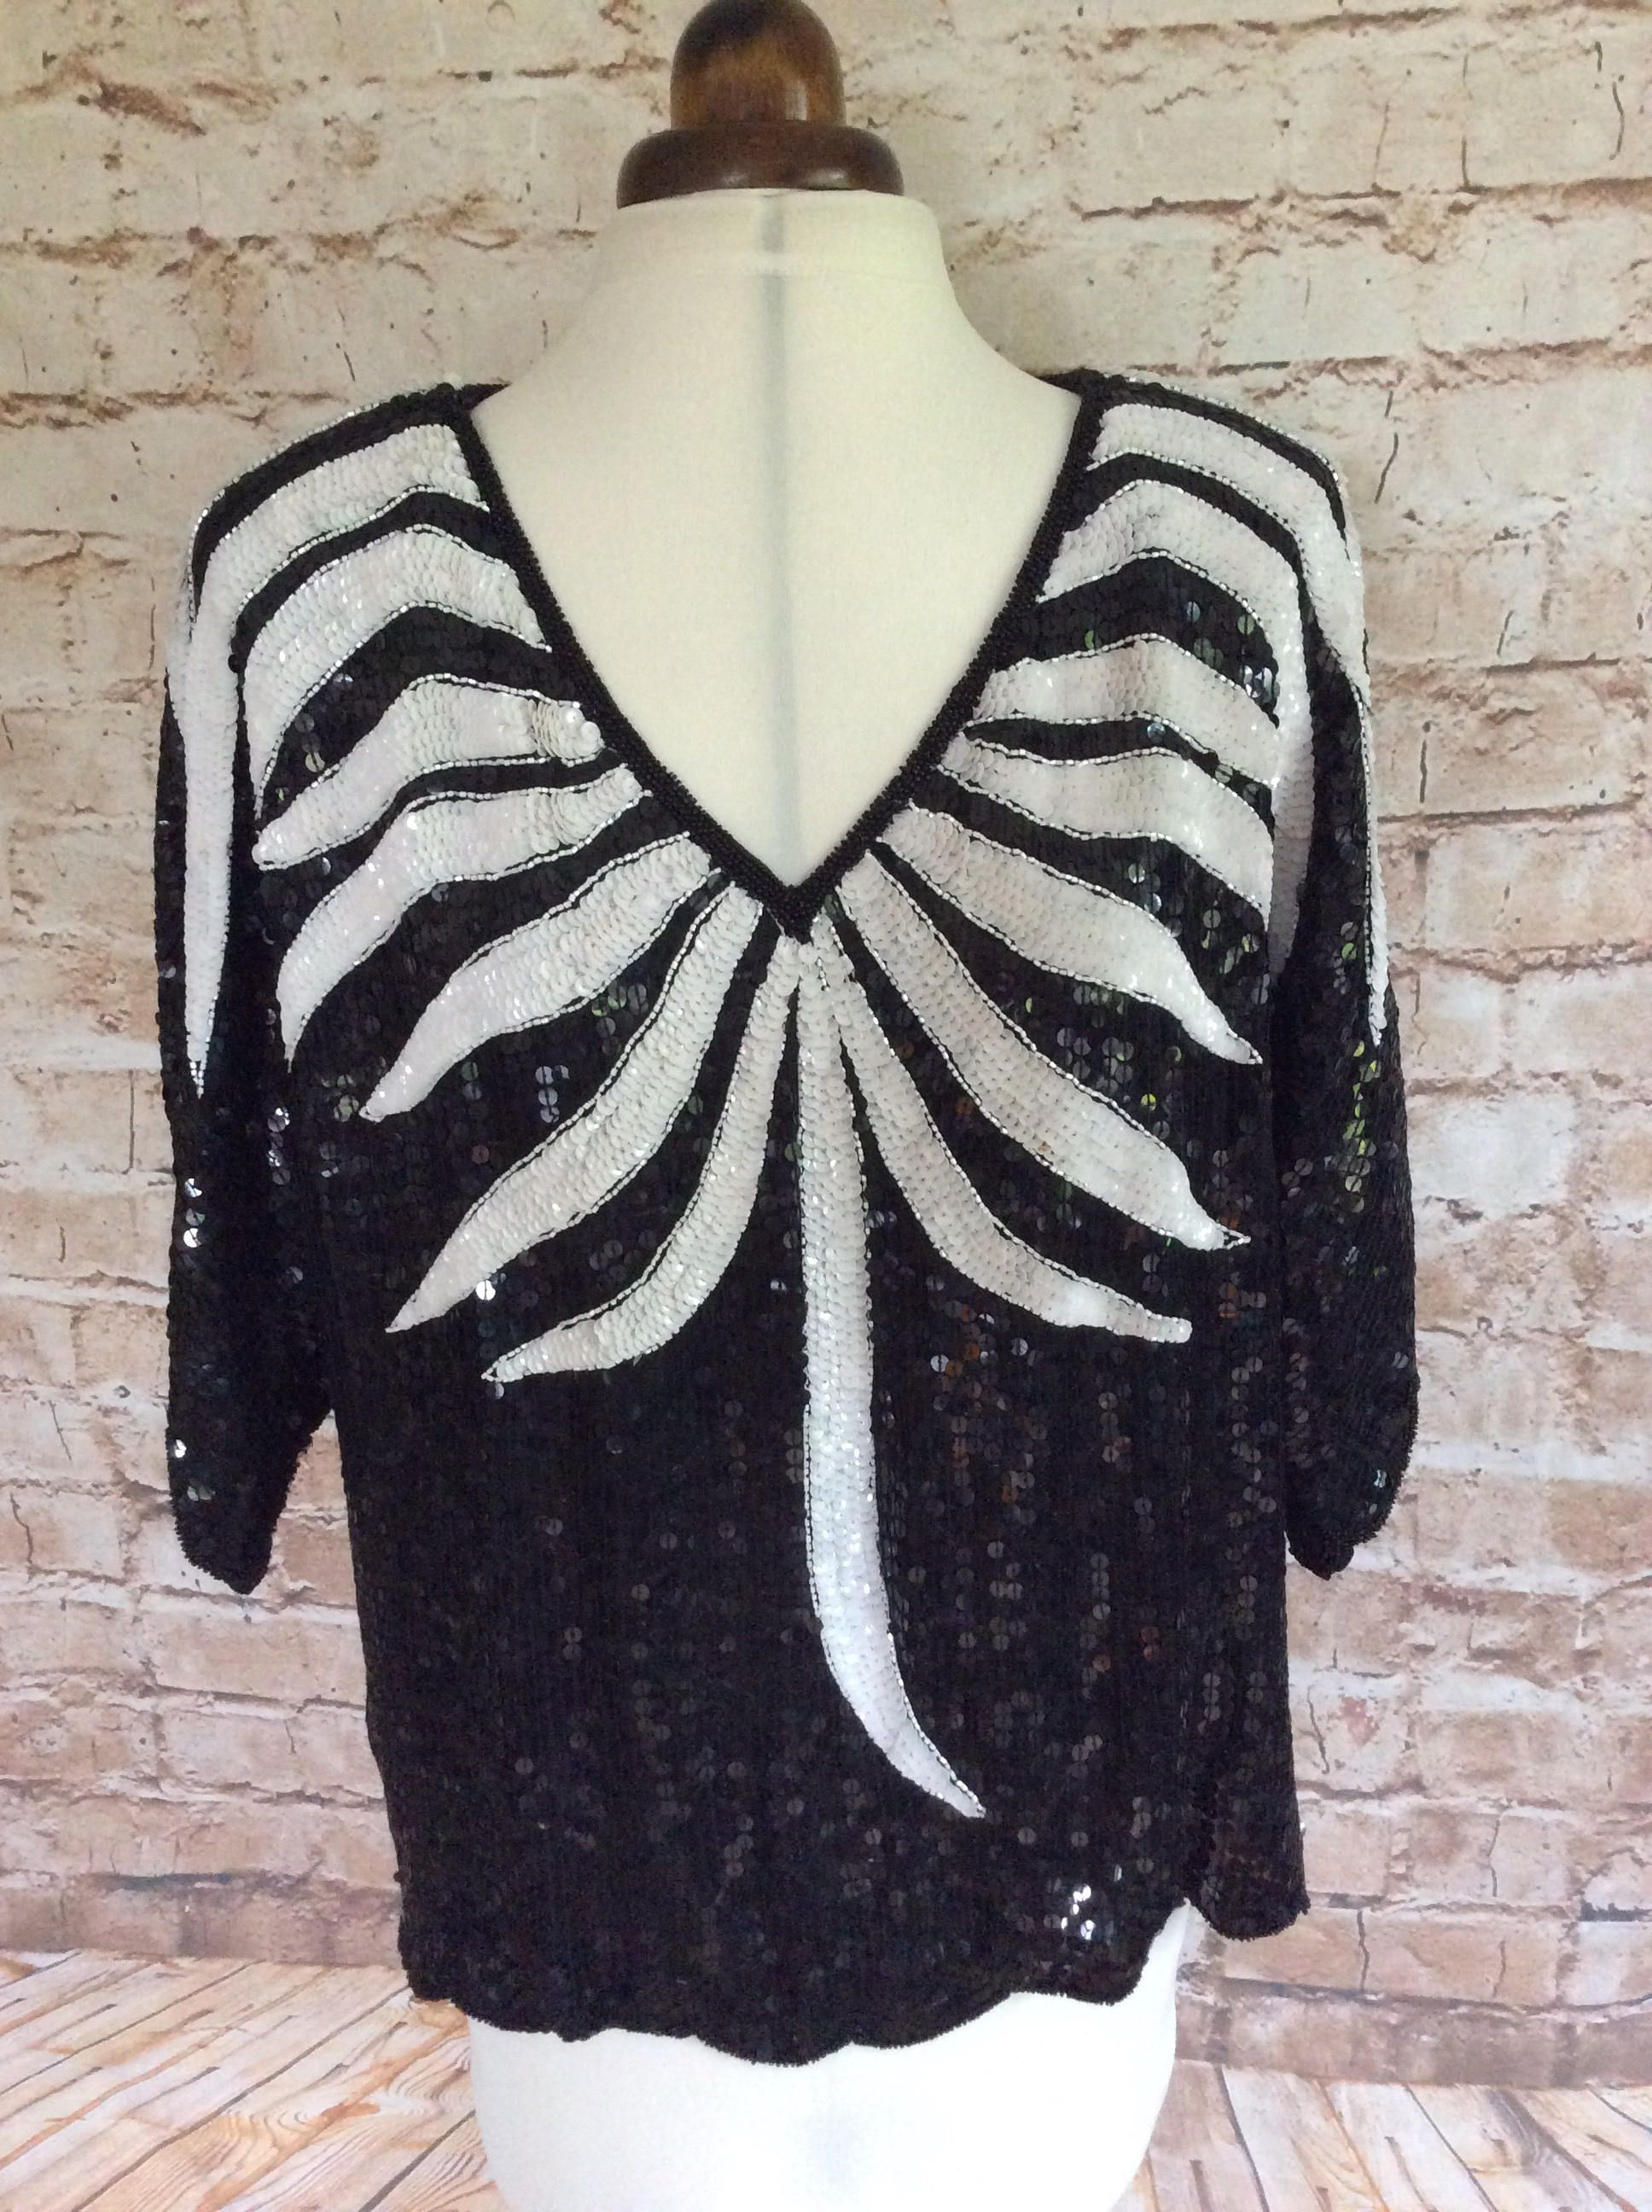 Vintage Evening Top Sequinned Frank Usher Designer Monochrome Black And White Wedding Party Occasion Bohemian Boho